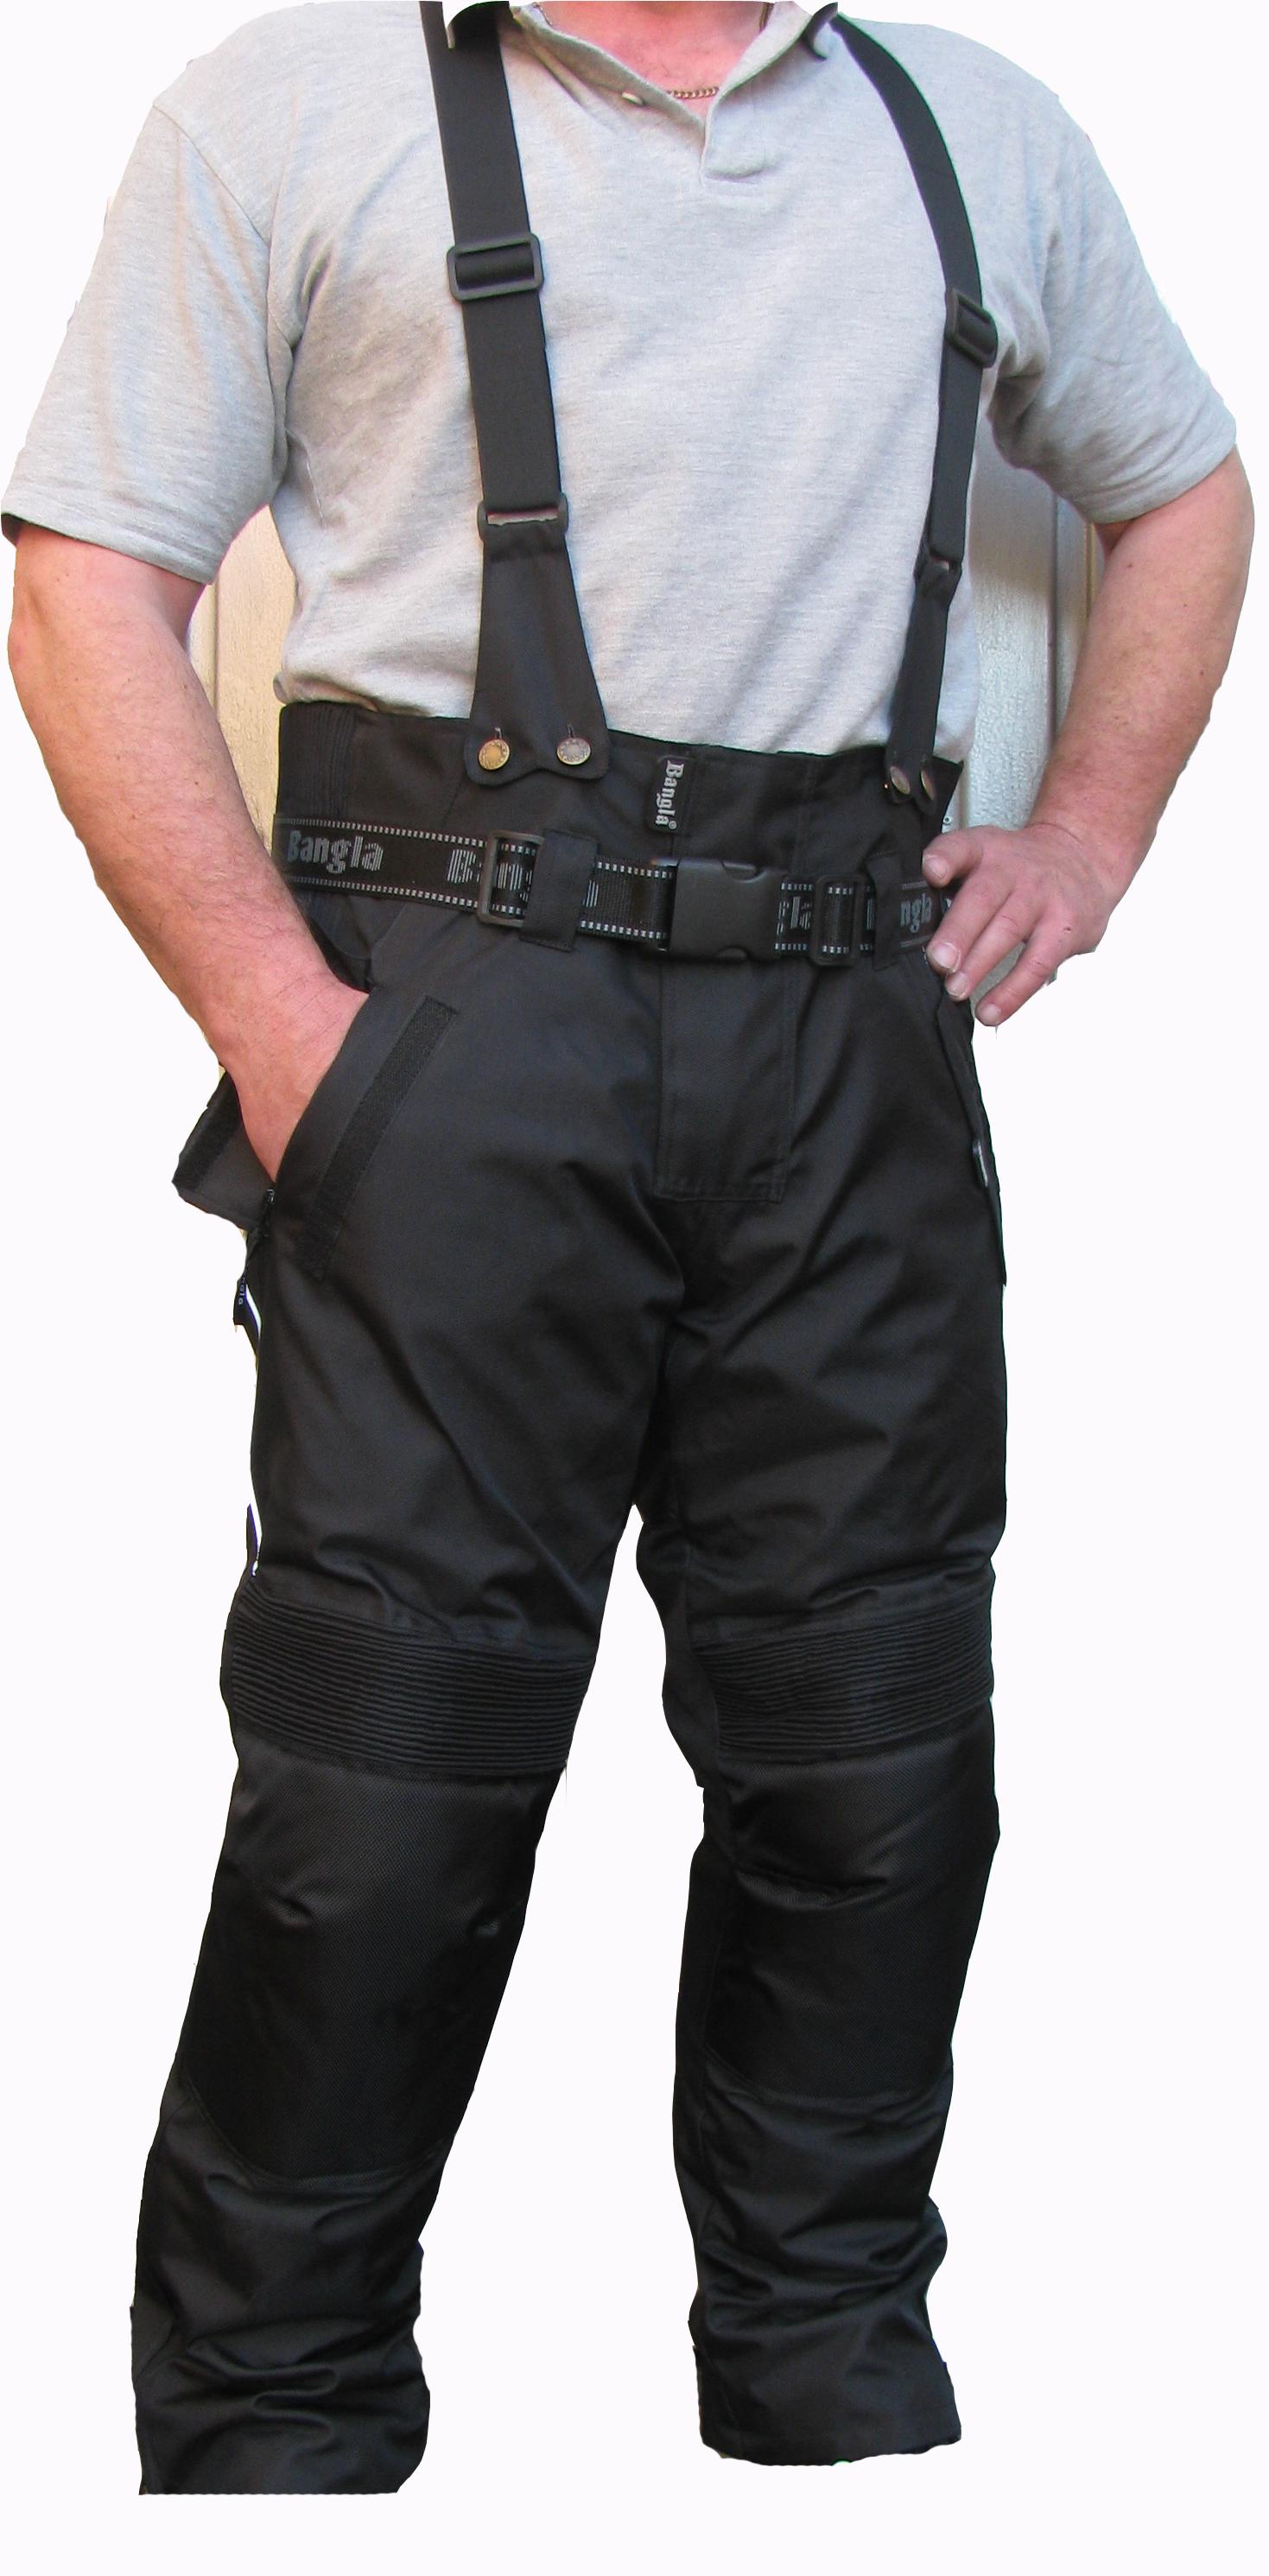 Bangla Motorrad Hose Cordura Schwarz Motorradhose mit Hosenträger 6 - 8 XL